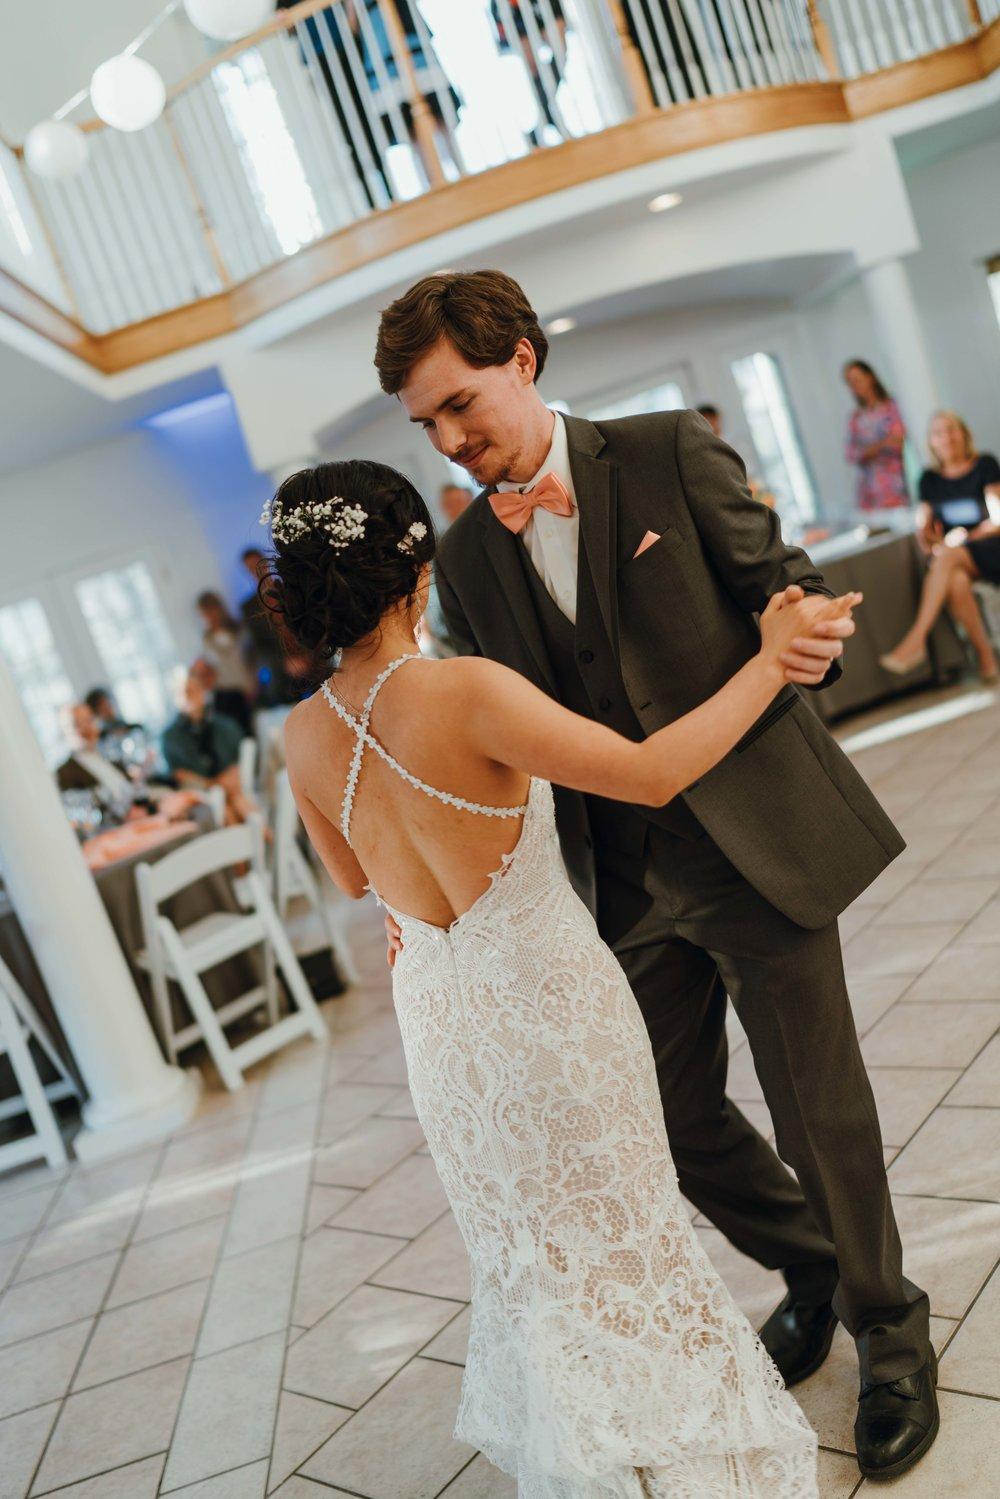 denver wedding photographer lioncrest manor in lyons ben and mali -DSC06566.jpg